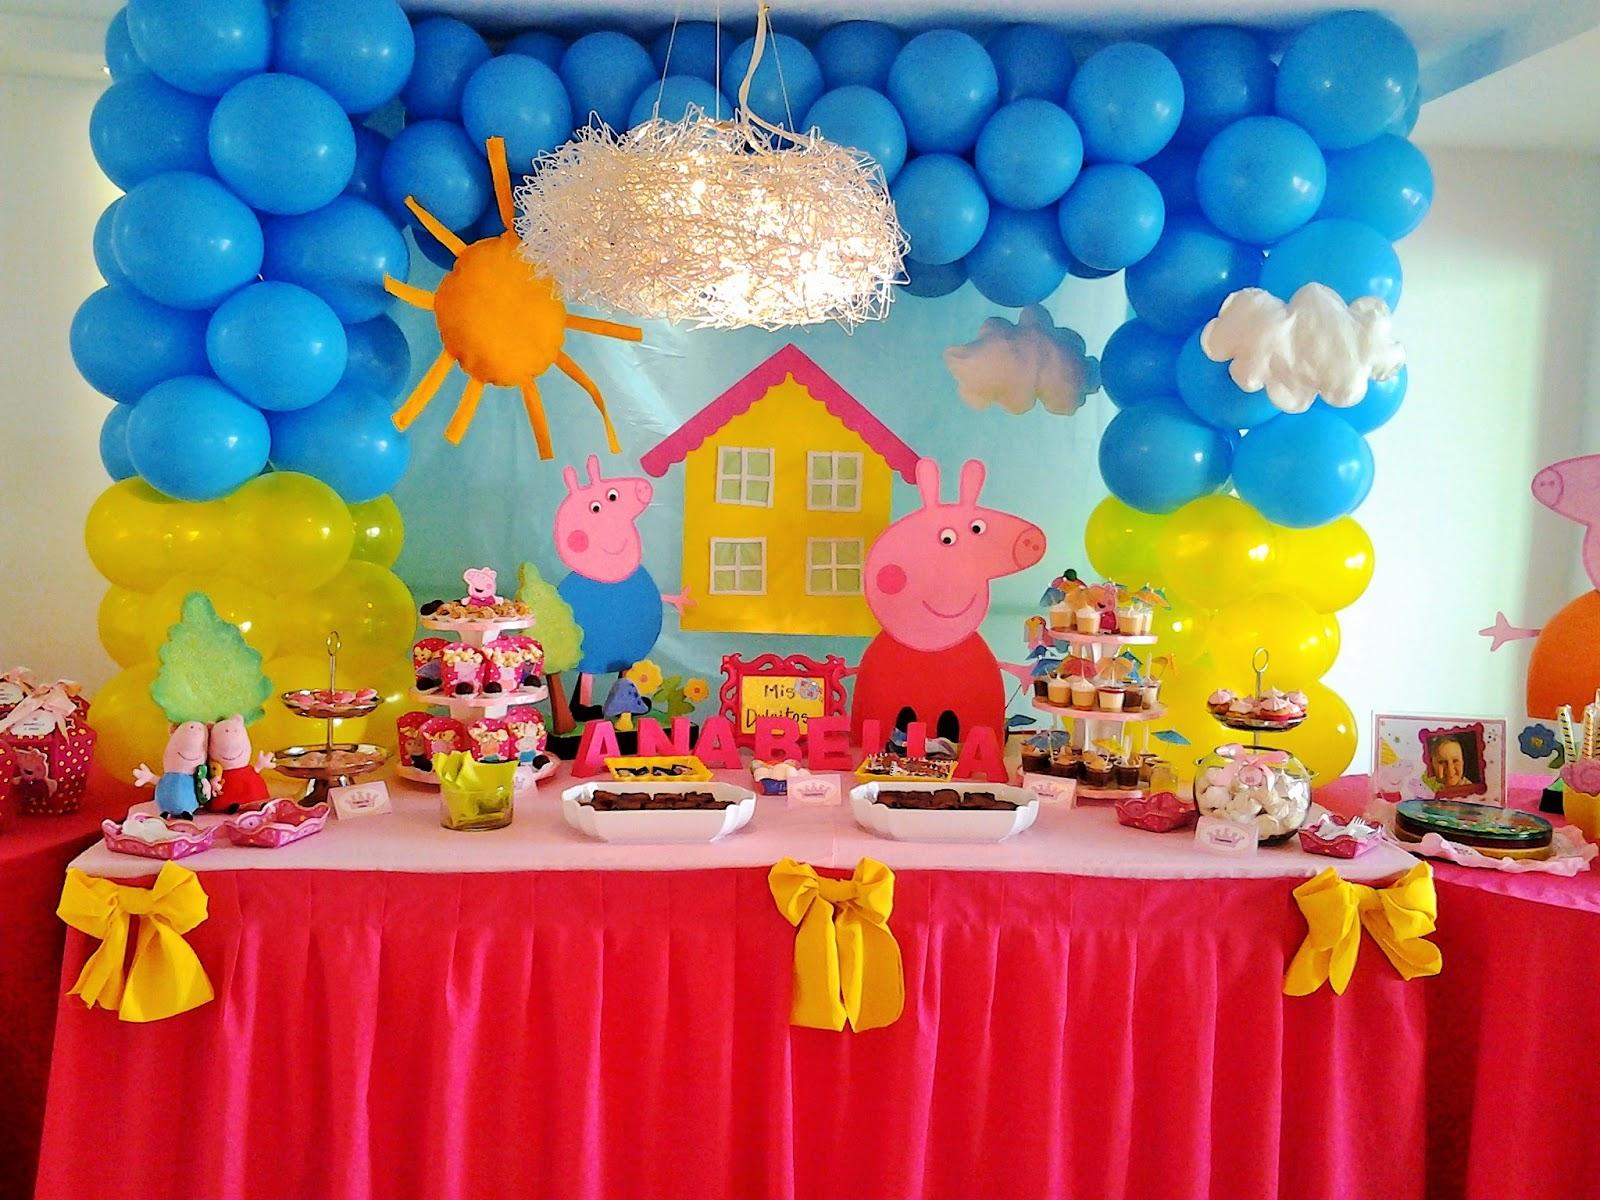 Decoracion Cumplea?os Peppa Pig ~ PKELANDIA Fiesta de Peppa Pig Cumplea?os de Anabella